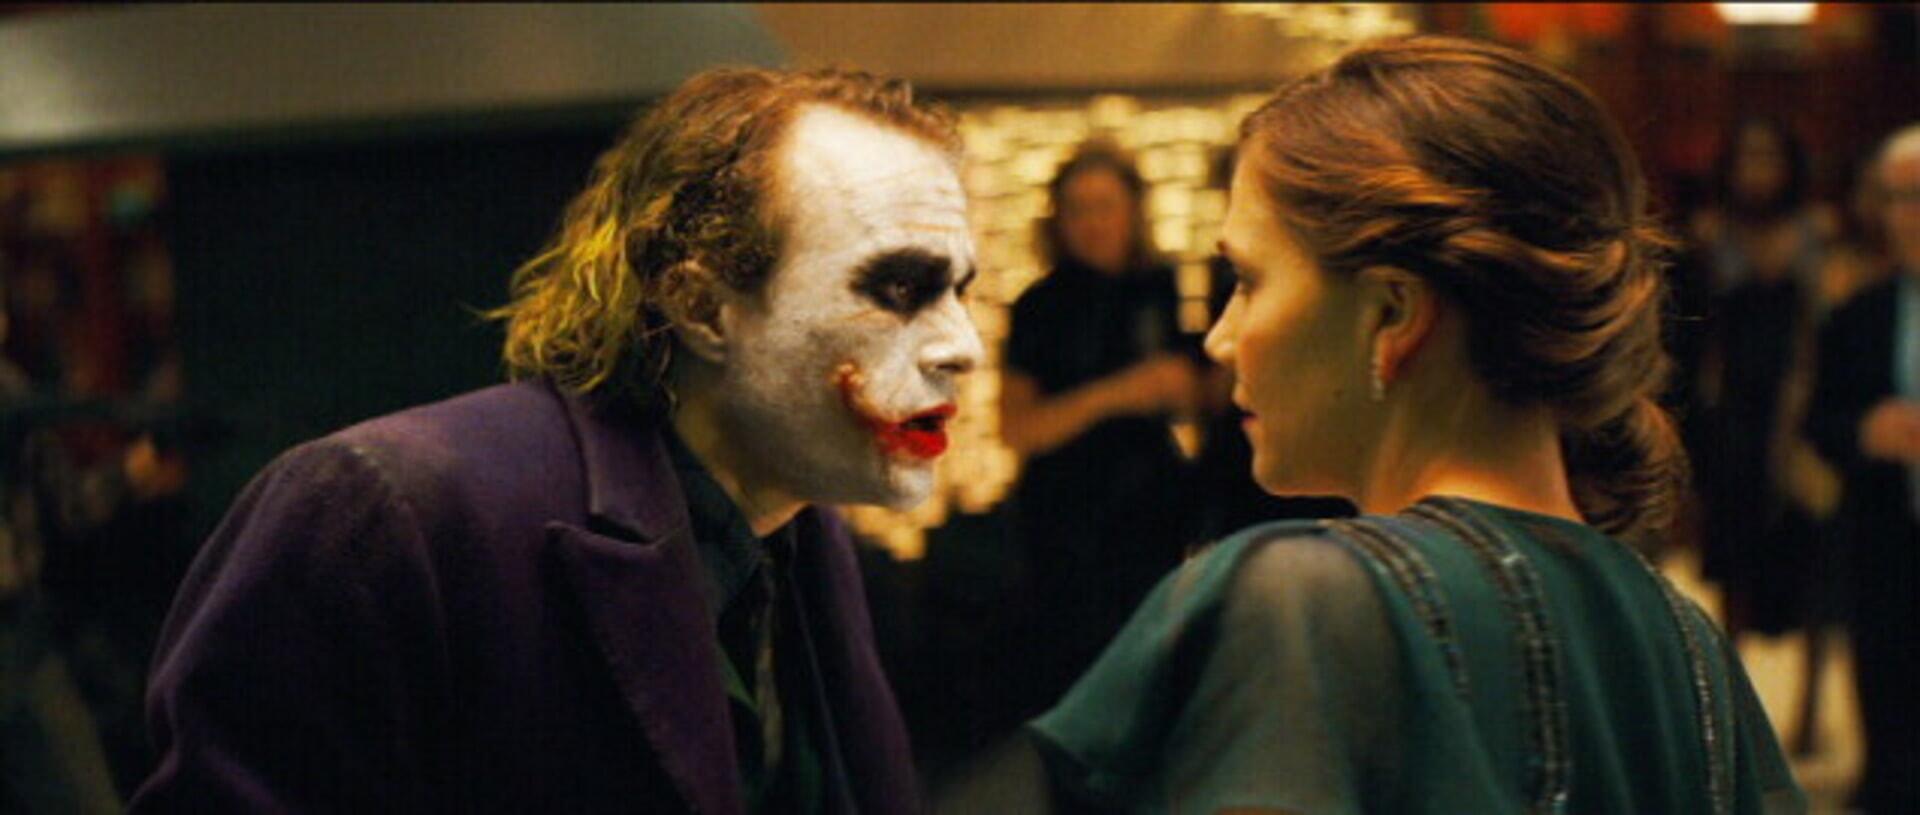 The Dark Knight - Image 42